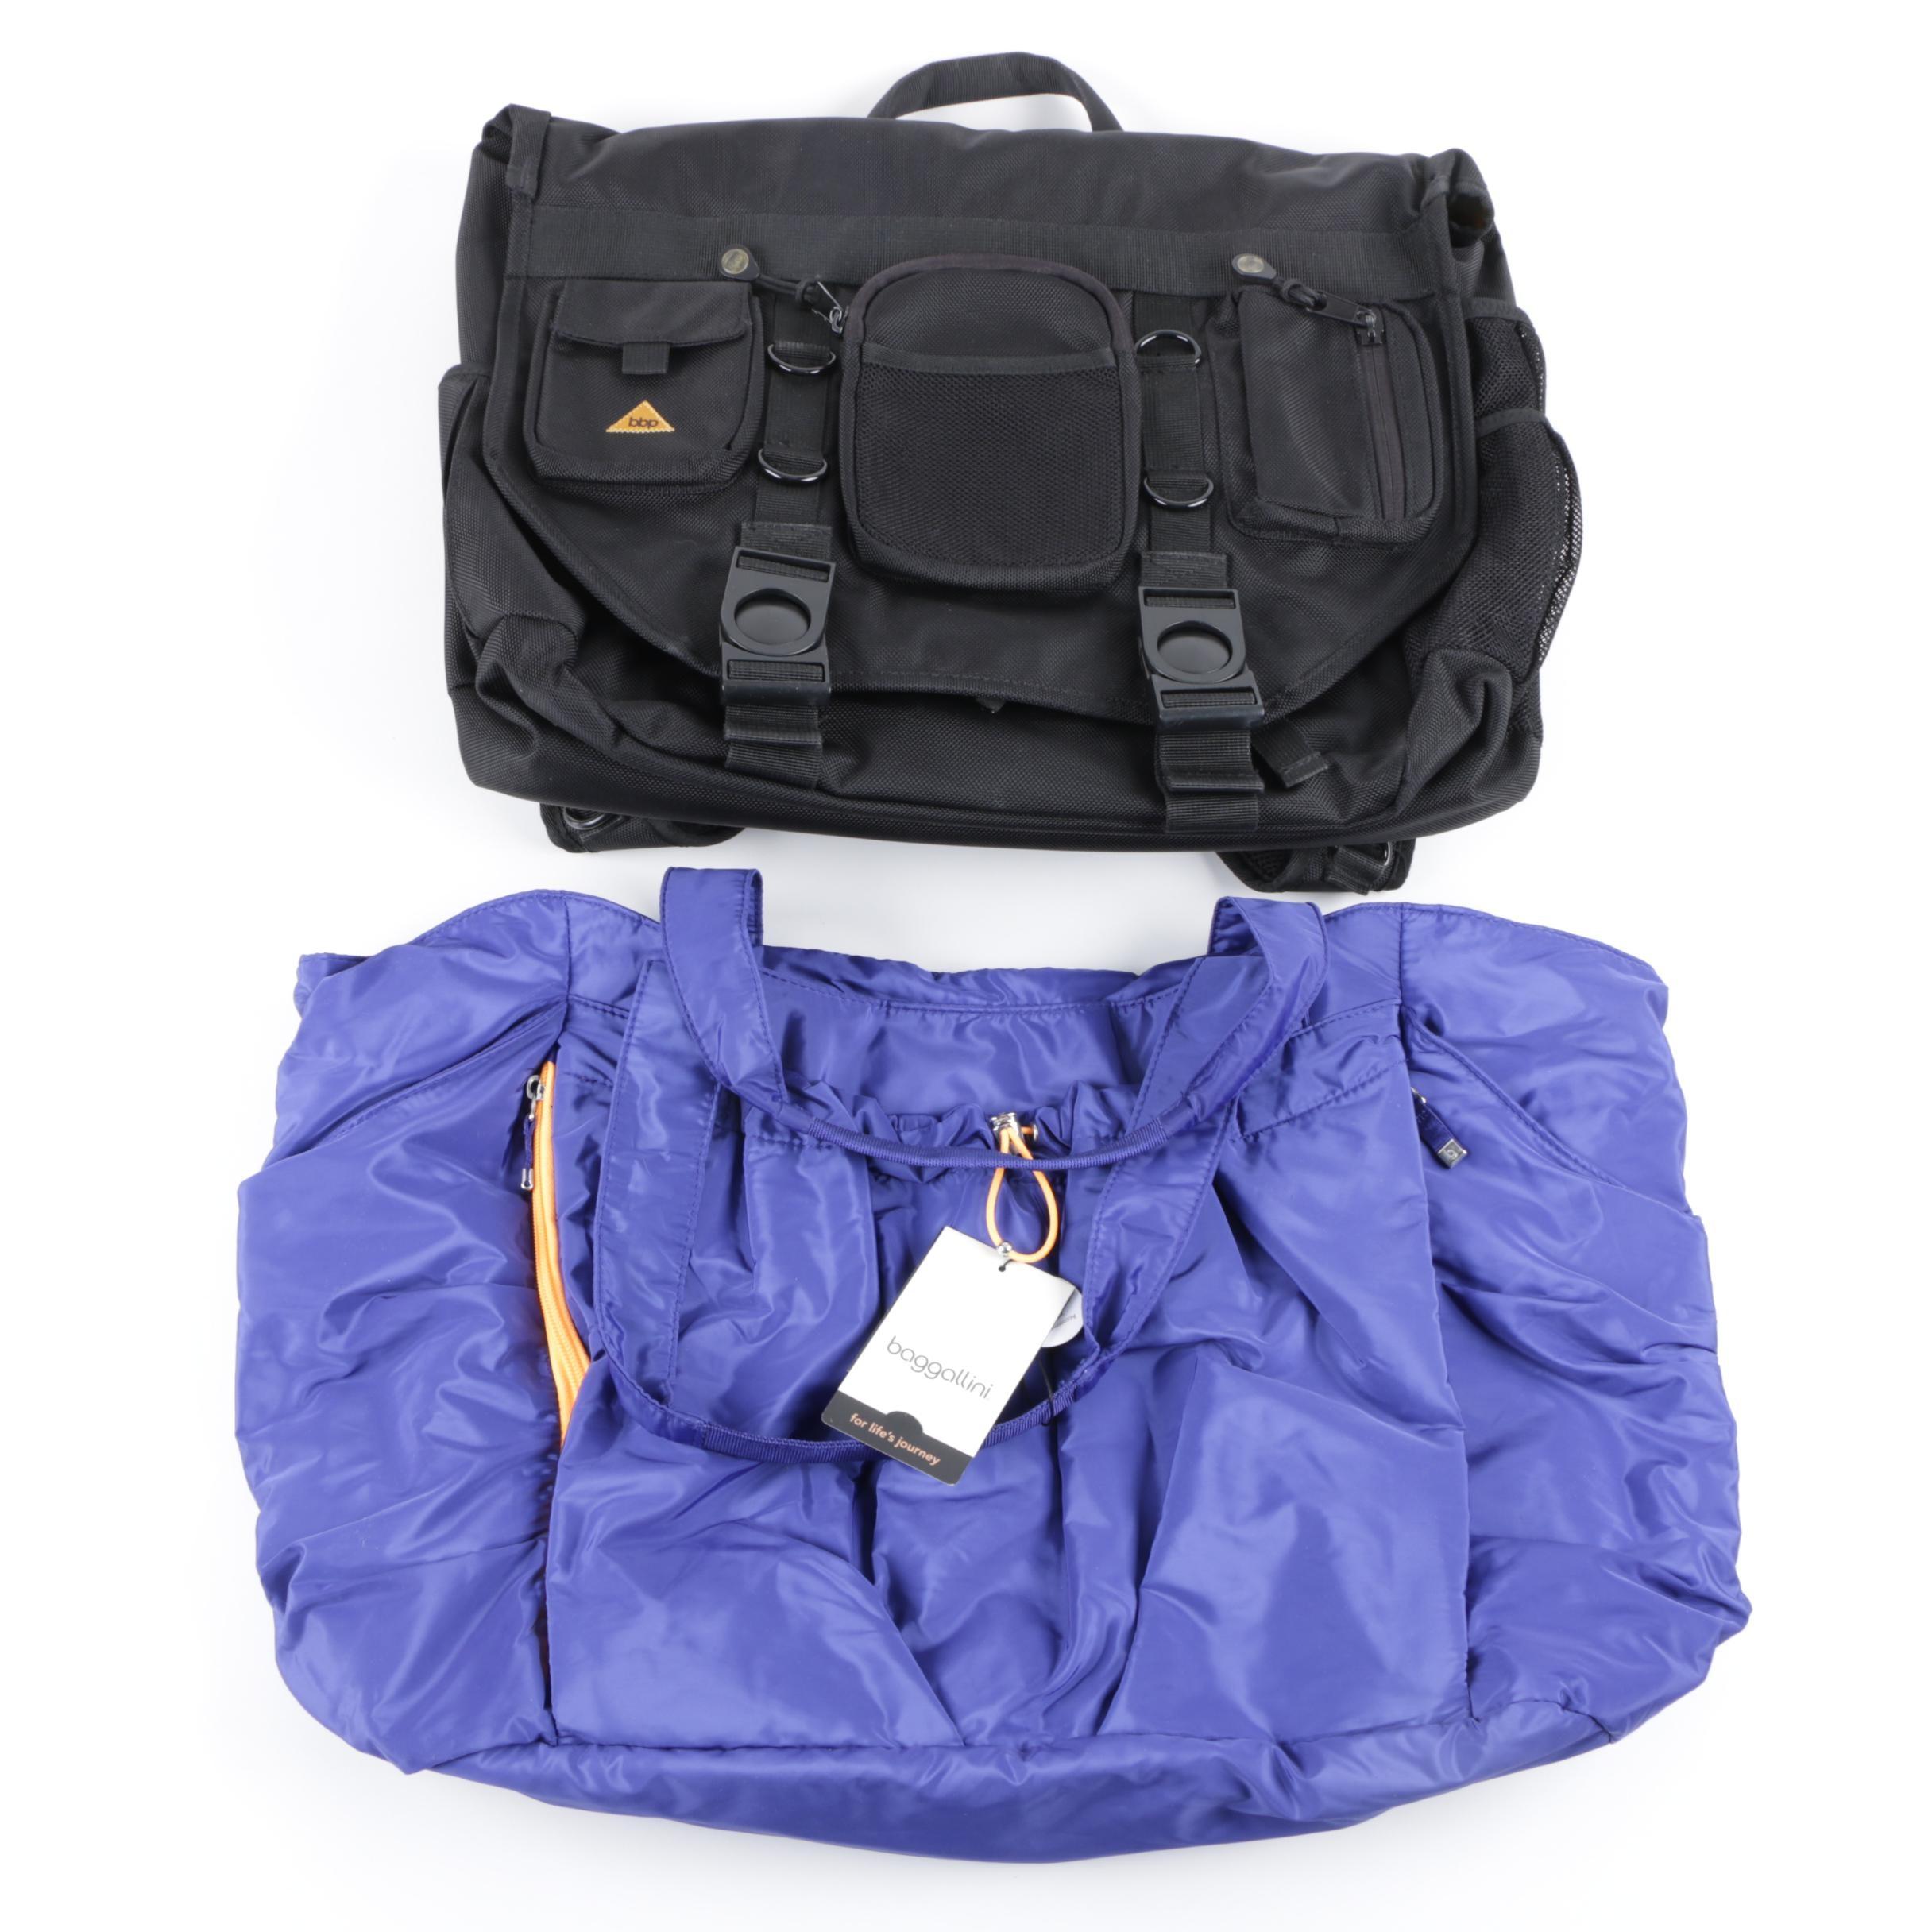 BBP Hamptons Hybrid Bag and BG by Baggallini Yoga Tote